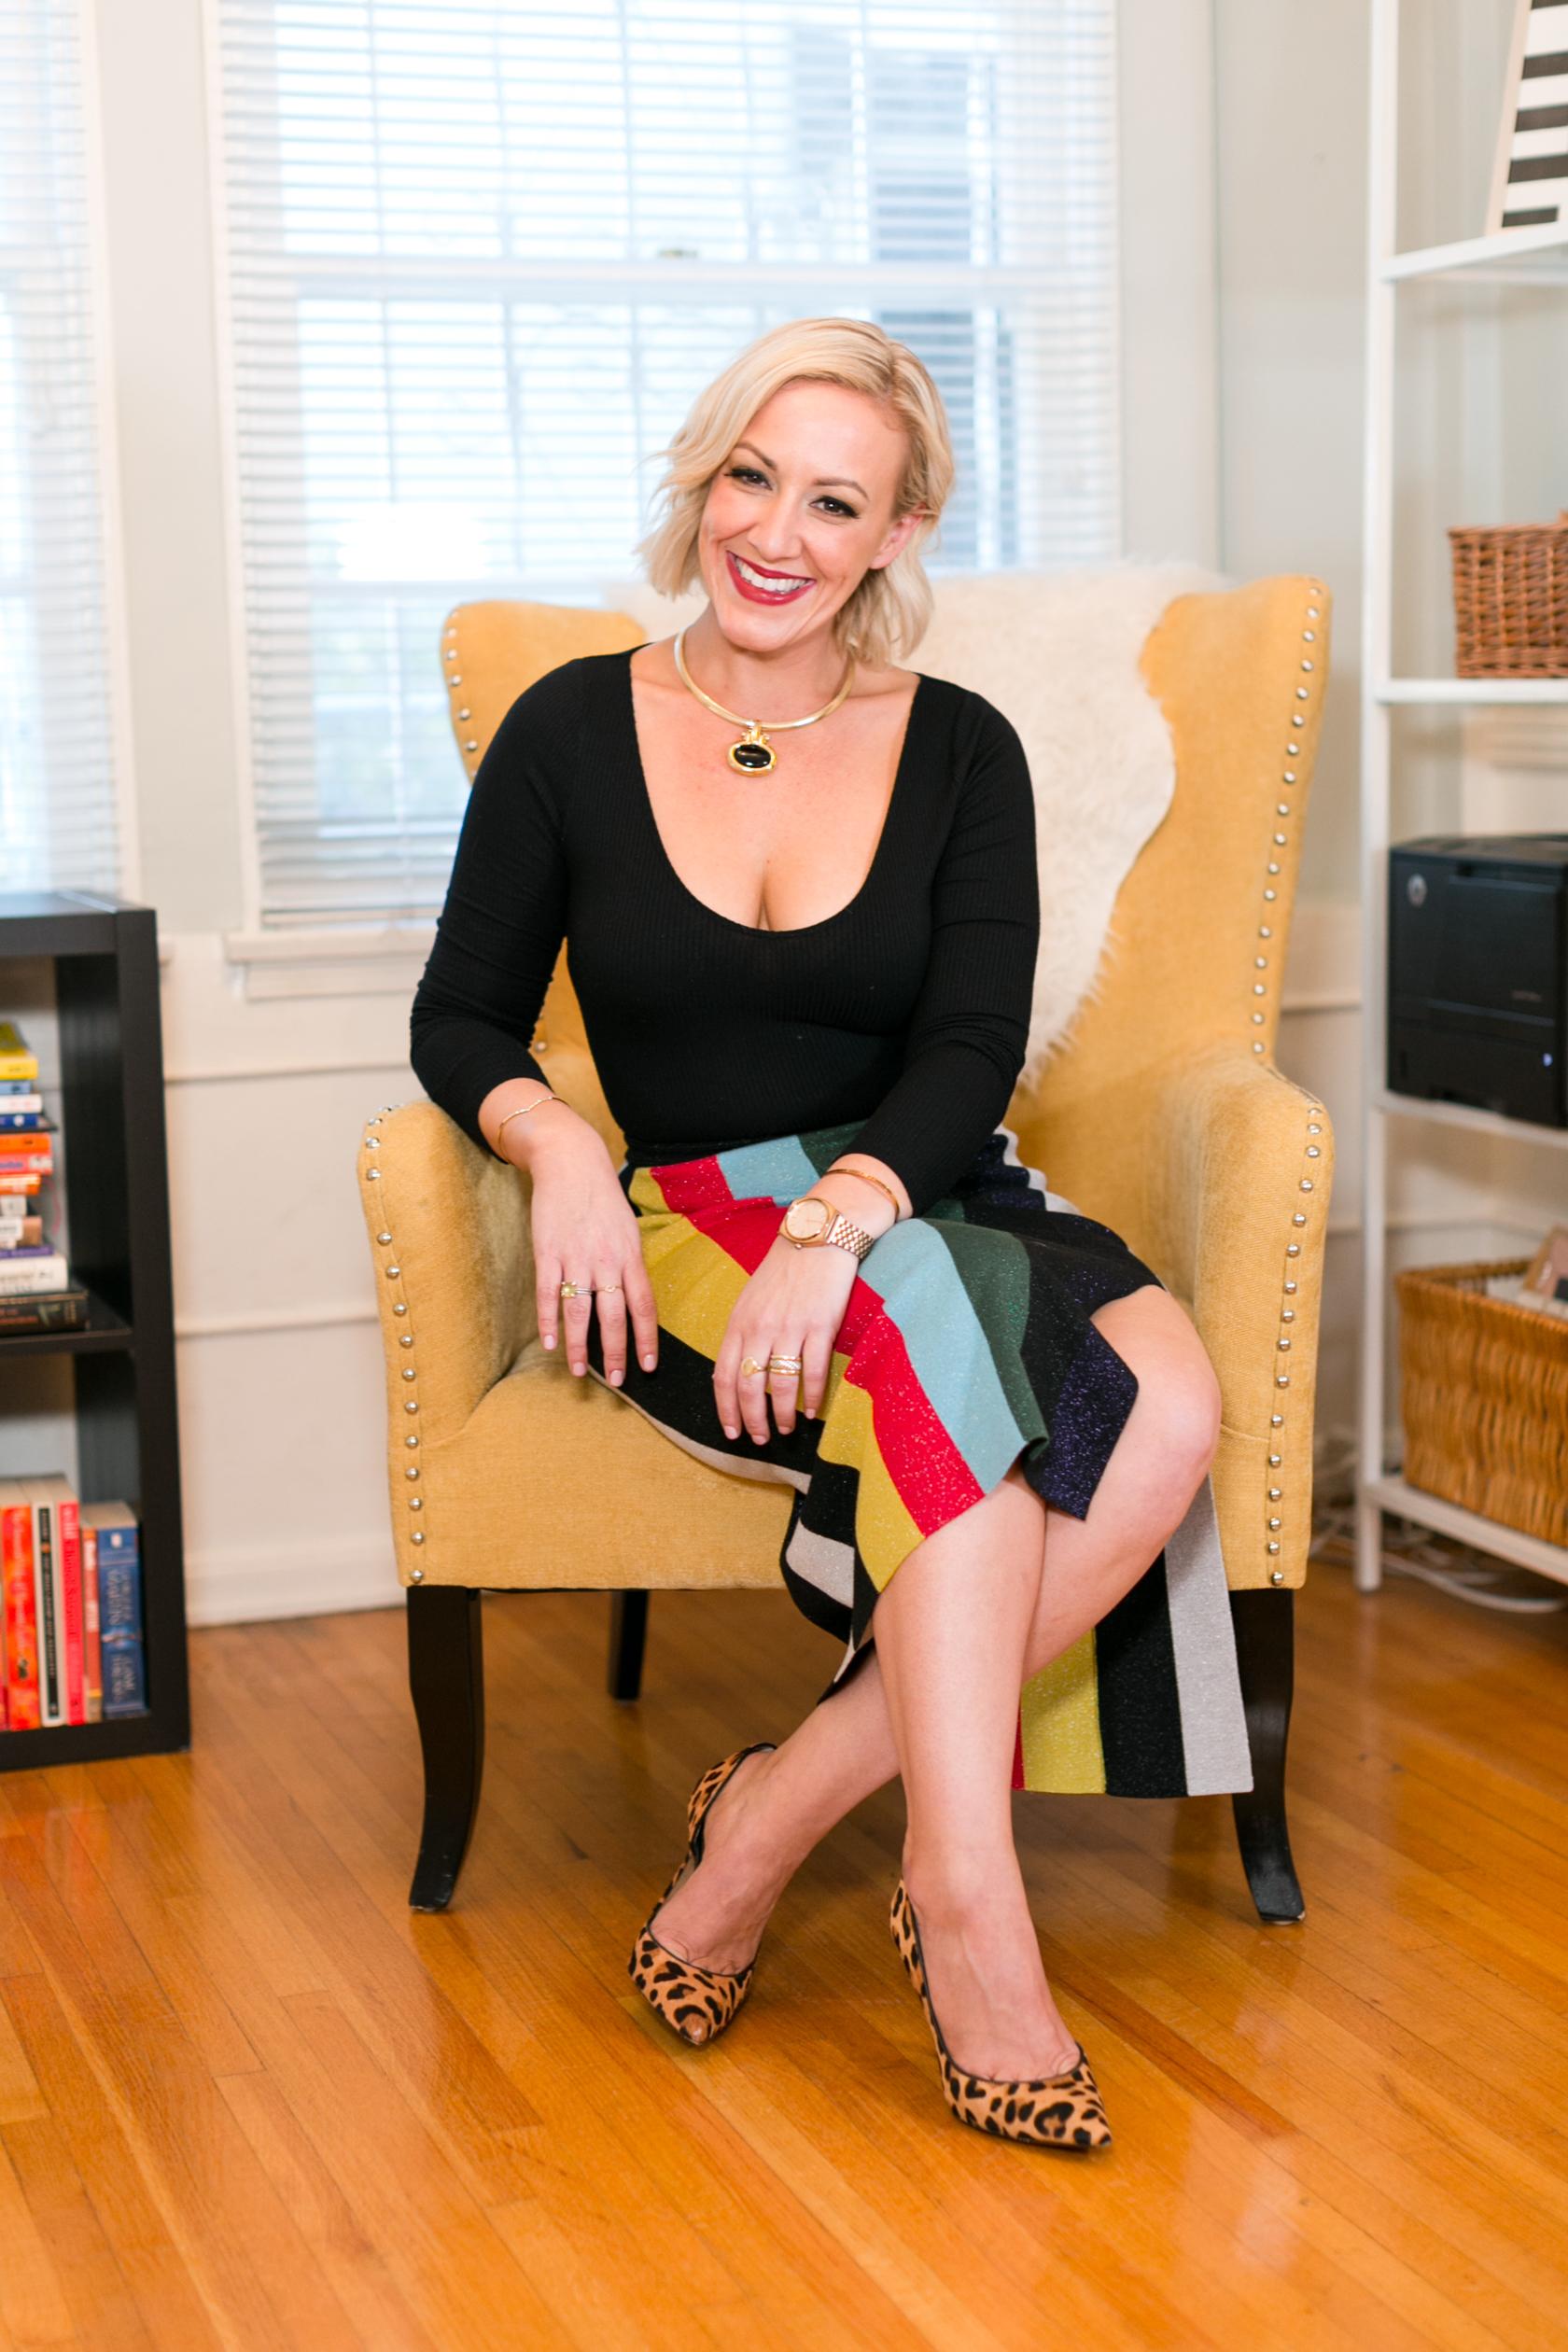 CourtneyPaigeRay_CitrineMarketing_BrandingPhotography_BLOG-5.jpg